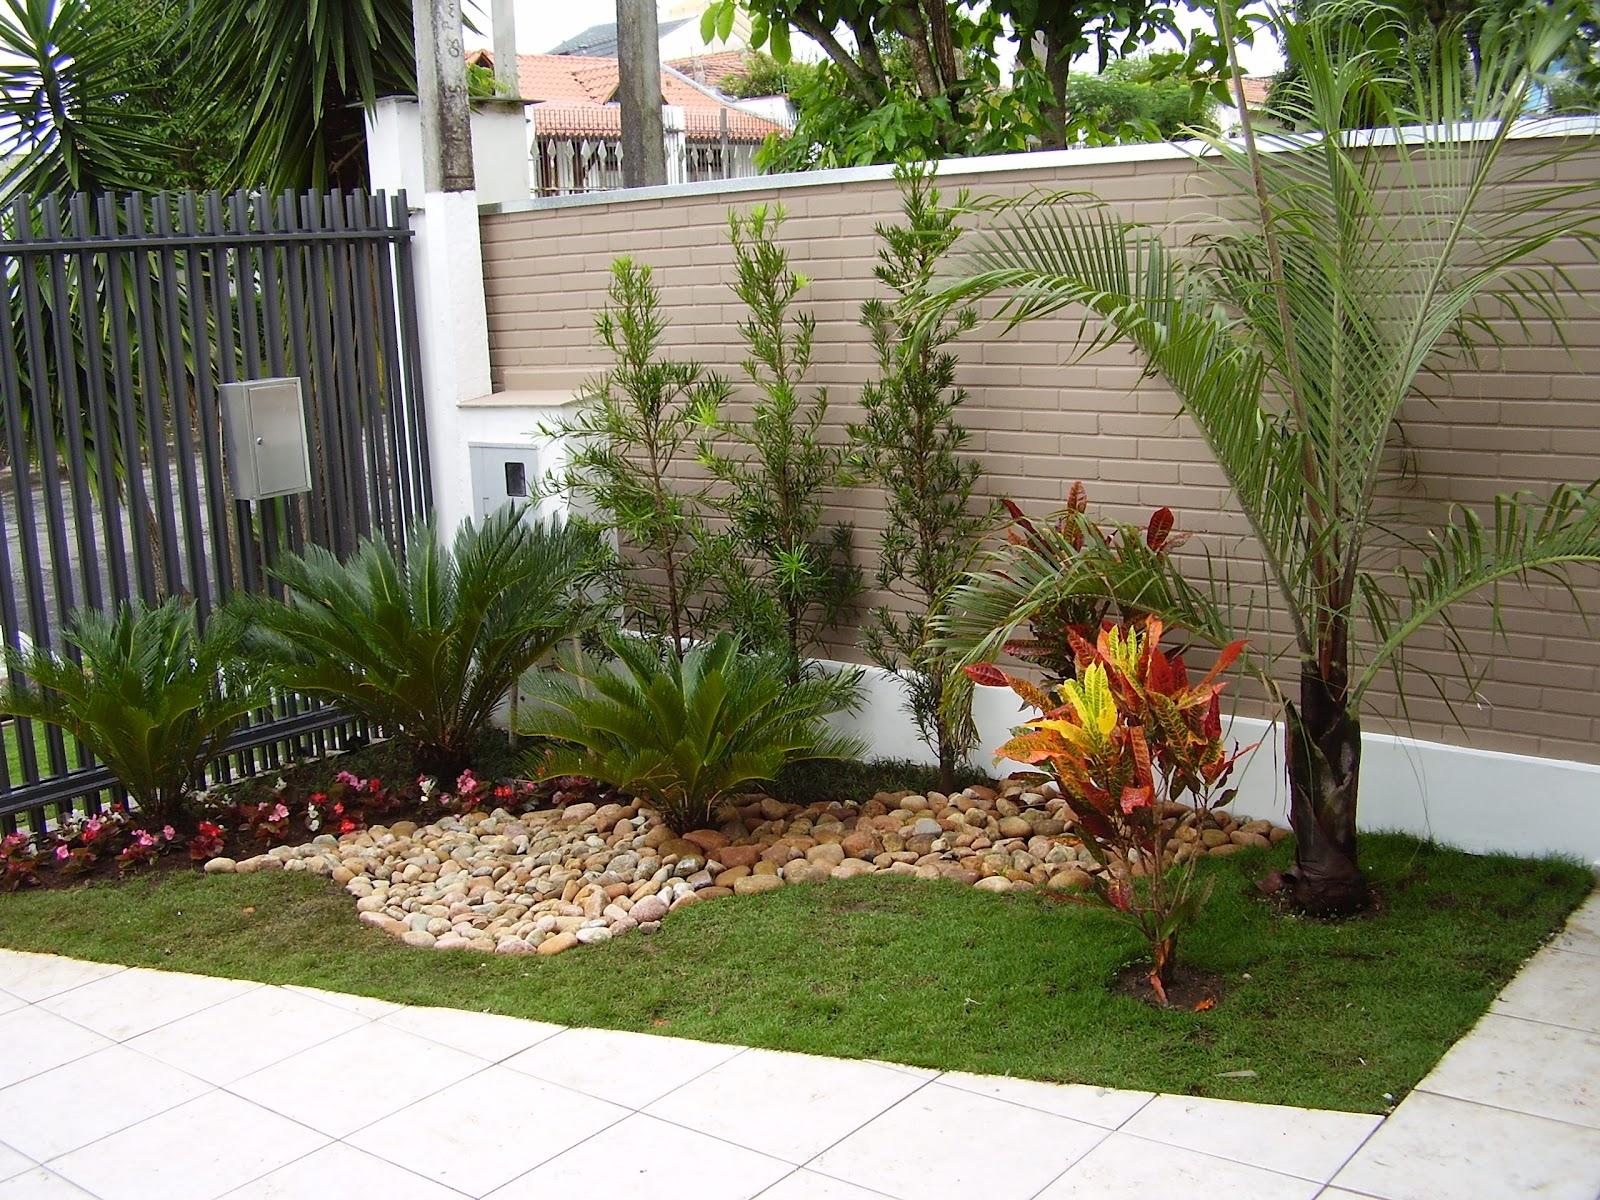 fotos jardins pequenos residenciais:Casa De Jardin Pequeno